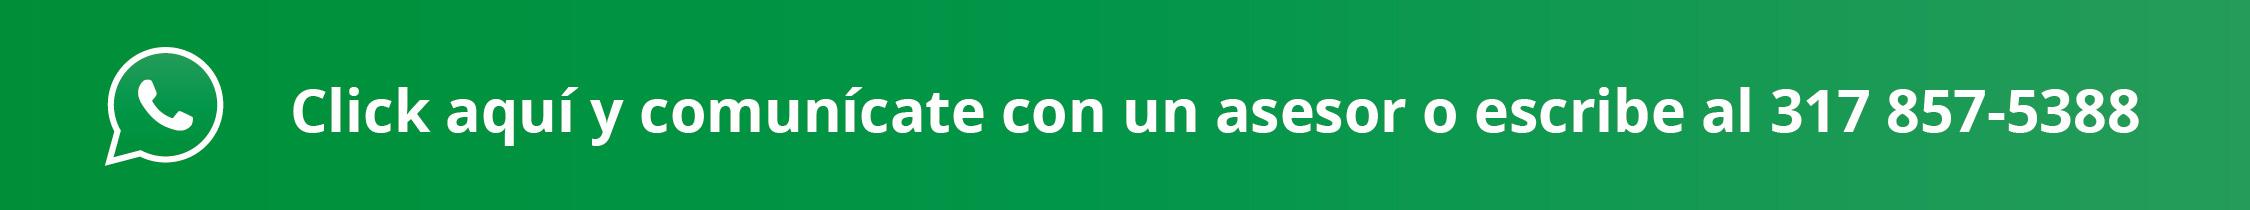 WhatsApp de Atención Banco de Bogotá - Ferreteria Samir